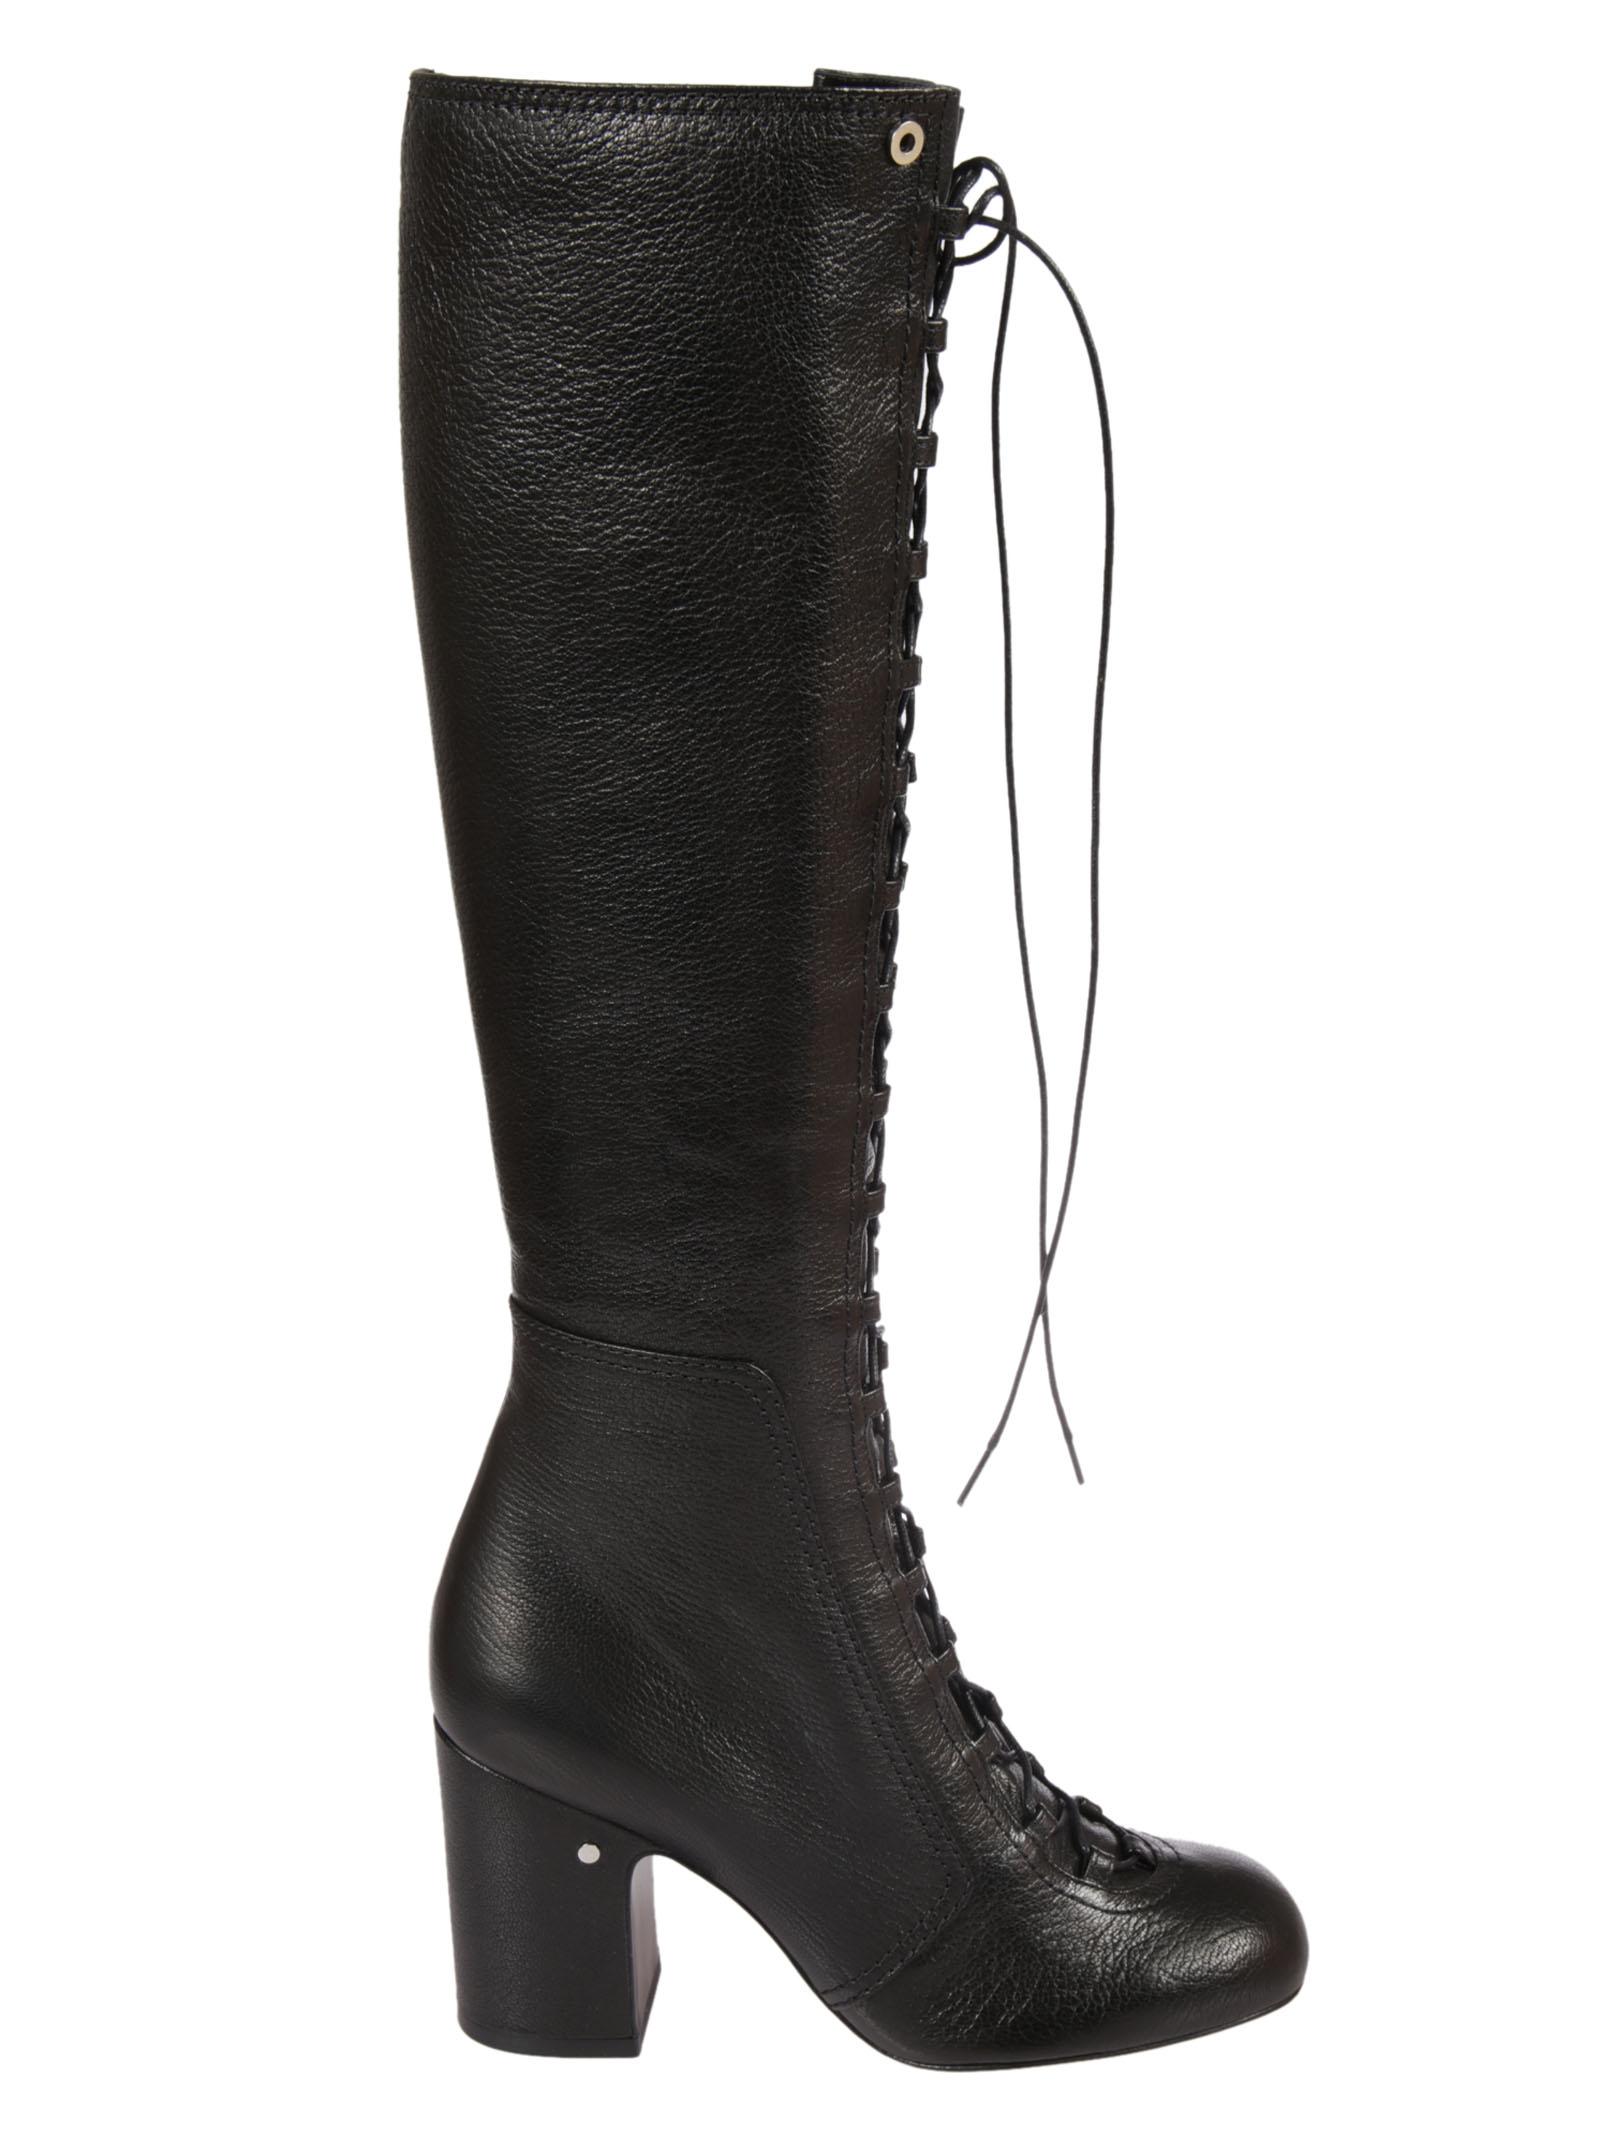 Laurence Dacade Laurence Dacade Mina Over-The-Knee Boots